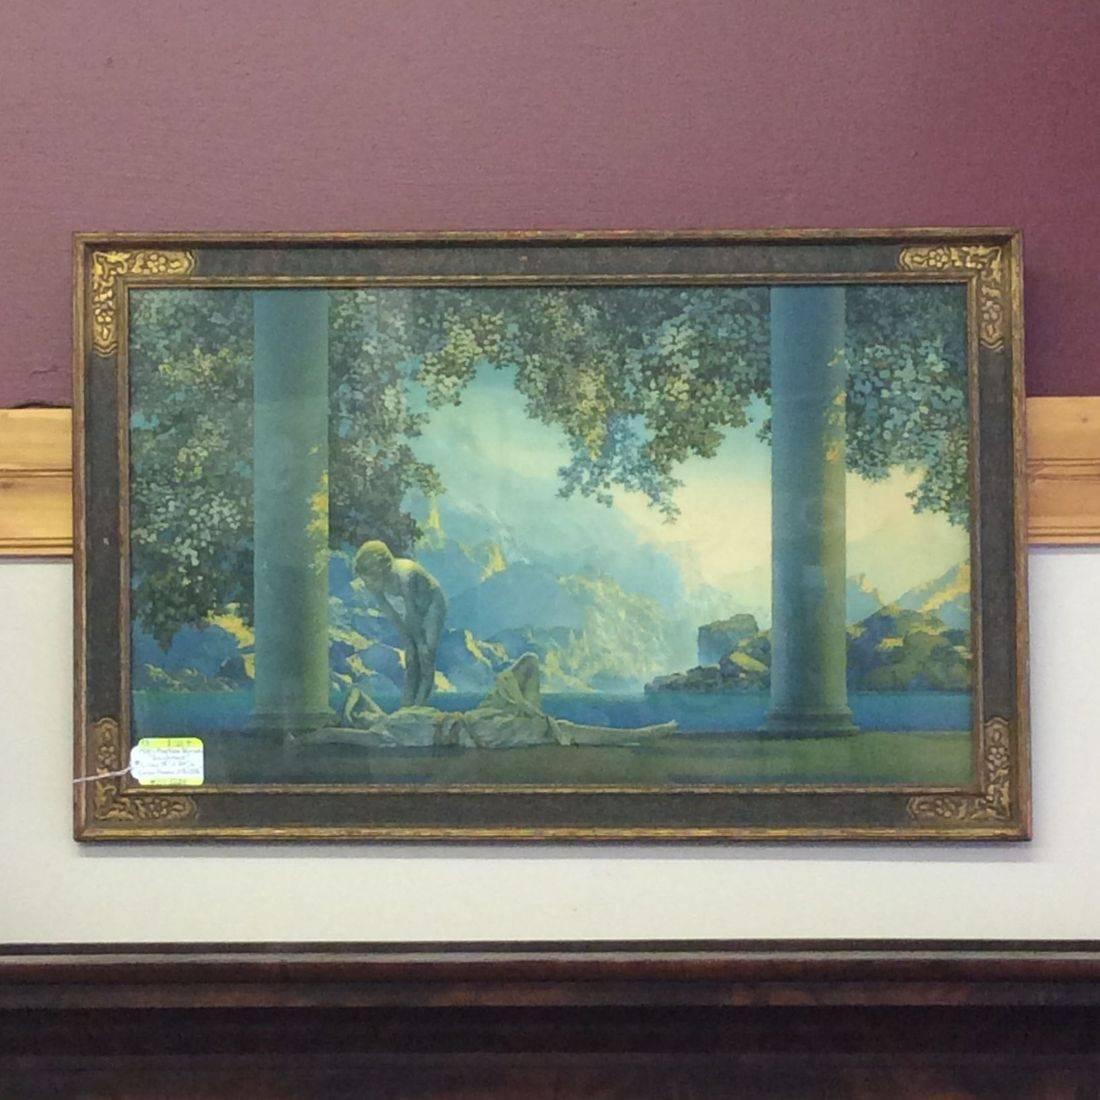 "1920's Maxfield Parrish ""Daybreak"" Litho  18-1/2"" x 30-1/2"" in Period Gesso 21-1/2"" x 33-1/2"" Frame   $155.00"